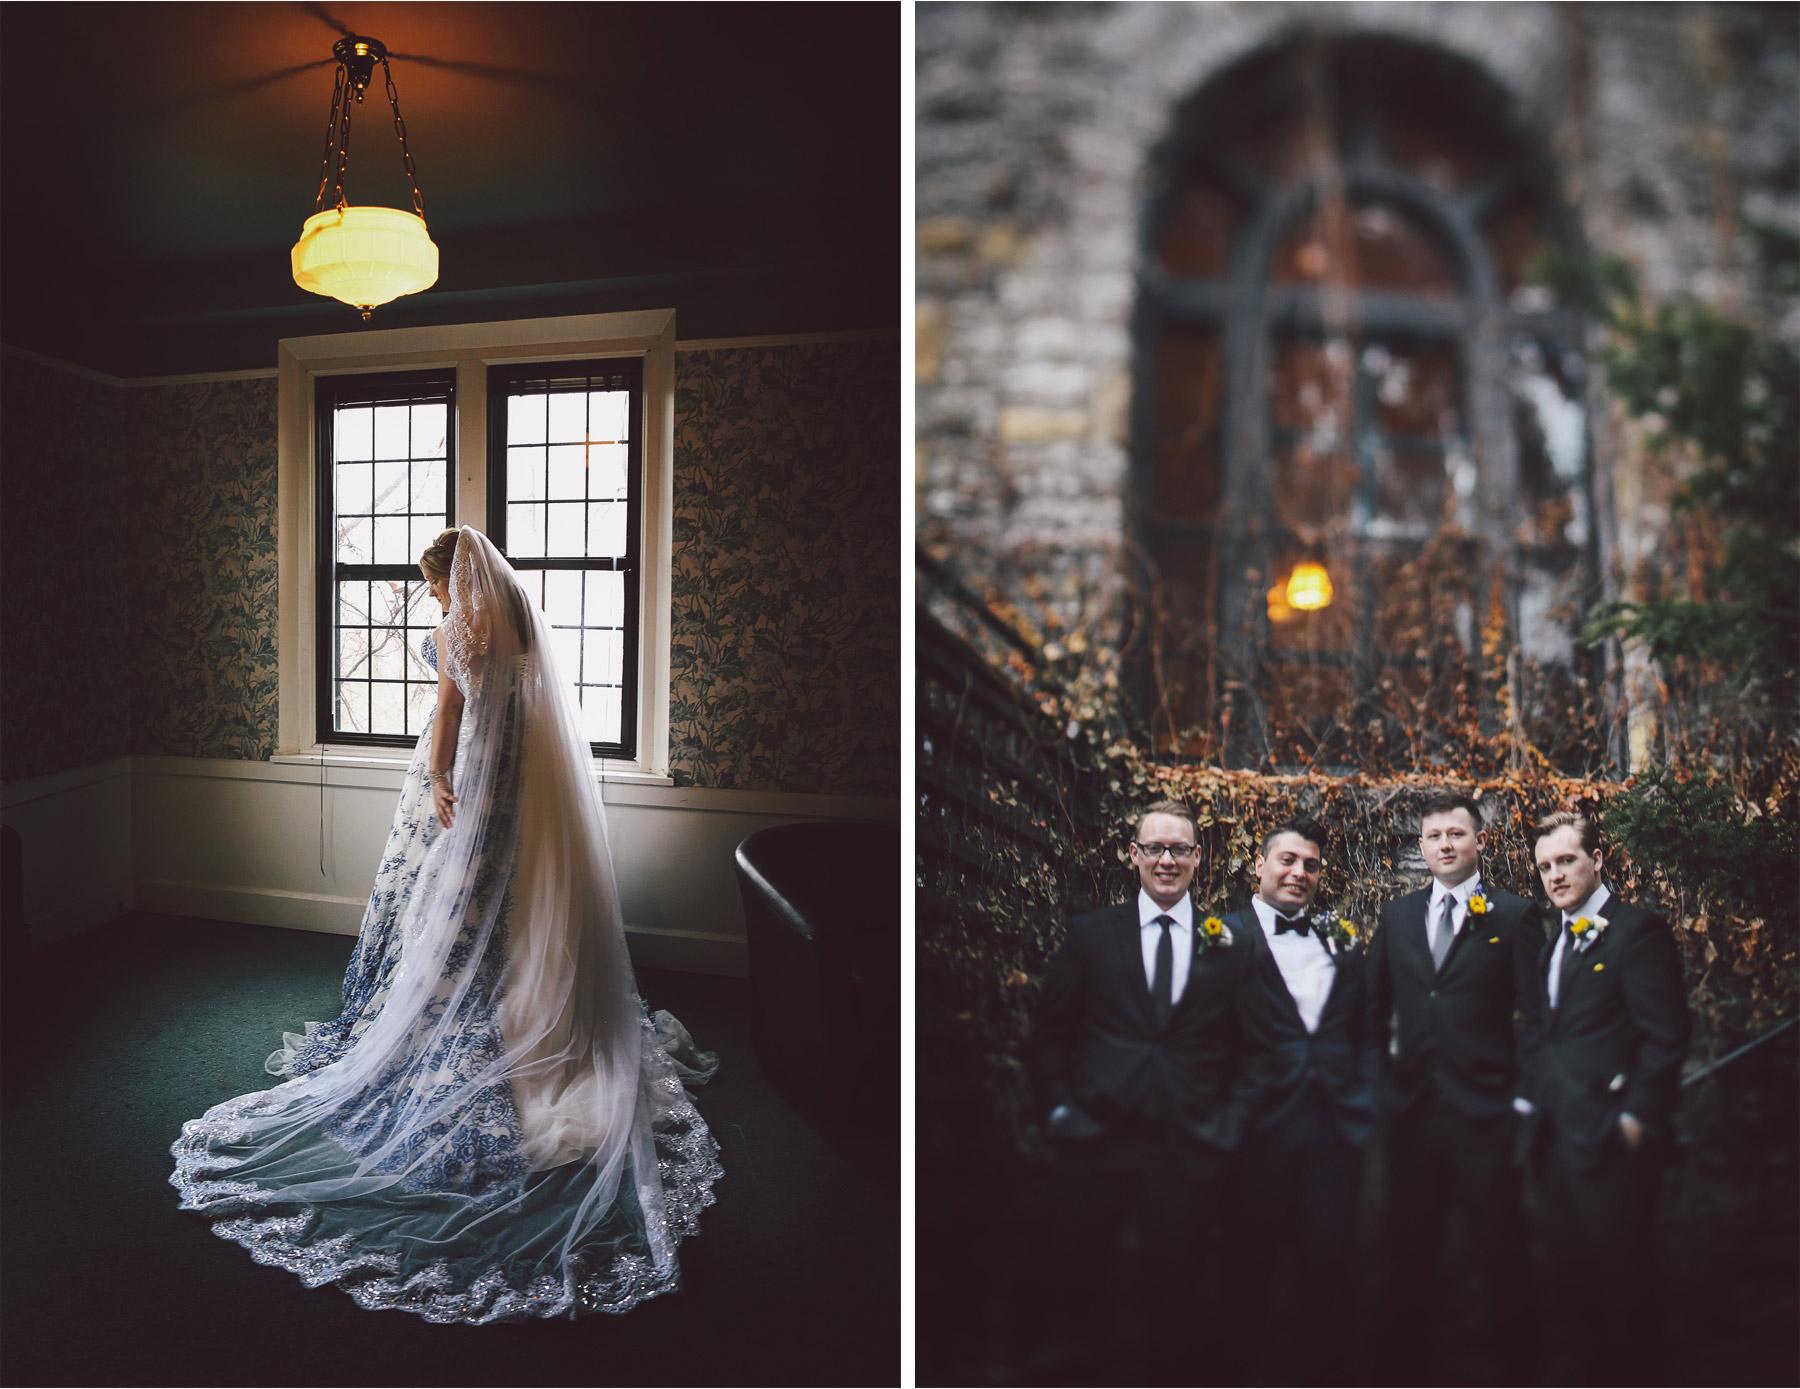 04-Saint-Paul-Minnesota-Wedding-Photography-by-Vick-Photography-The-University-Club-Bride-Groomsmen-Mari-and-Giuseppe.jpg